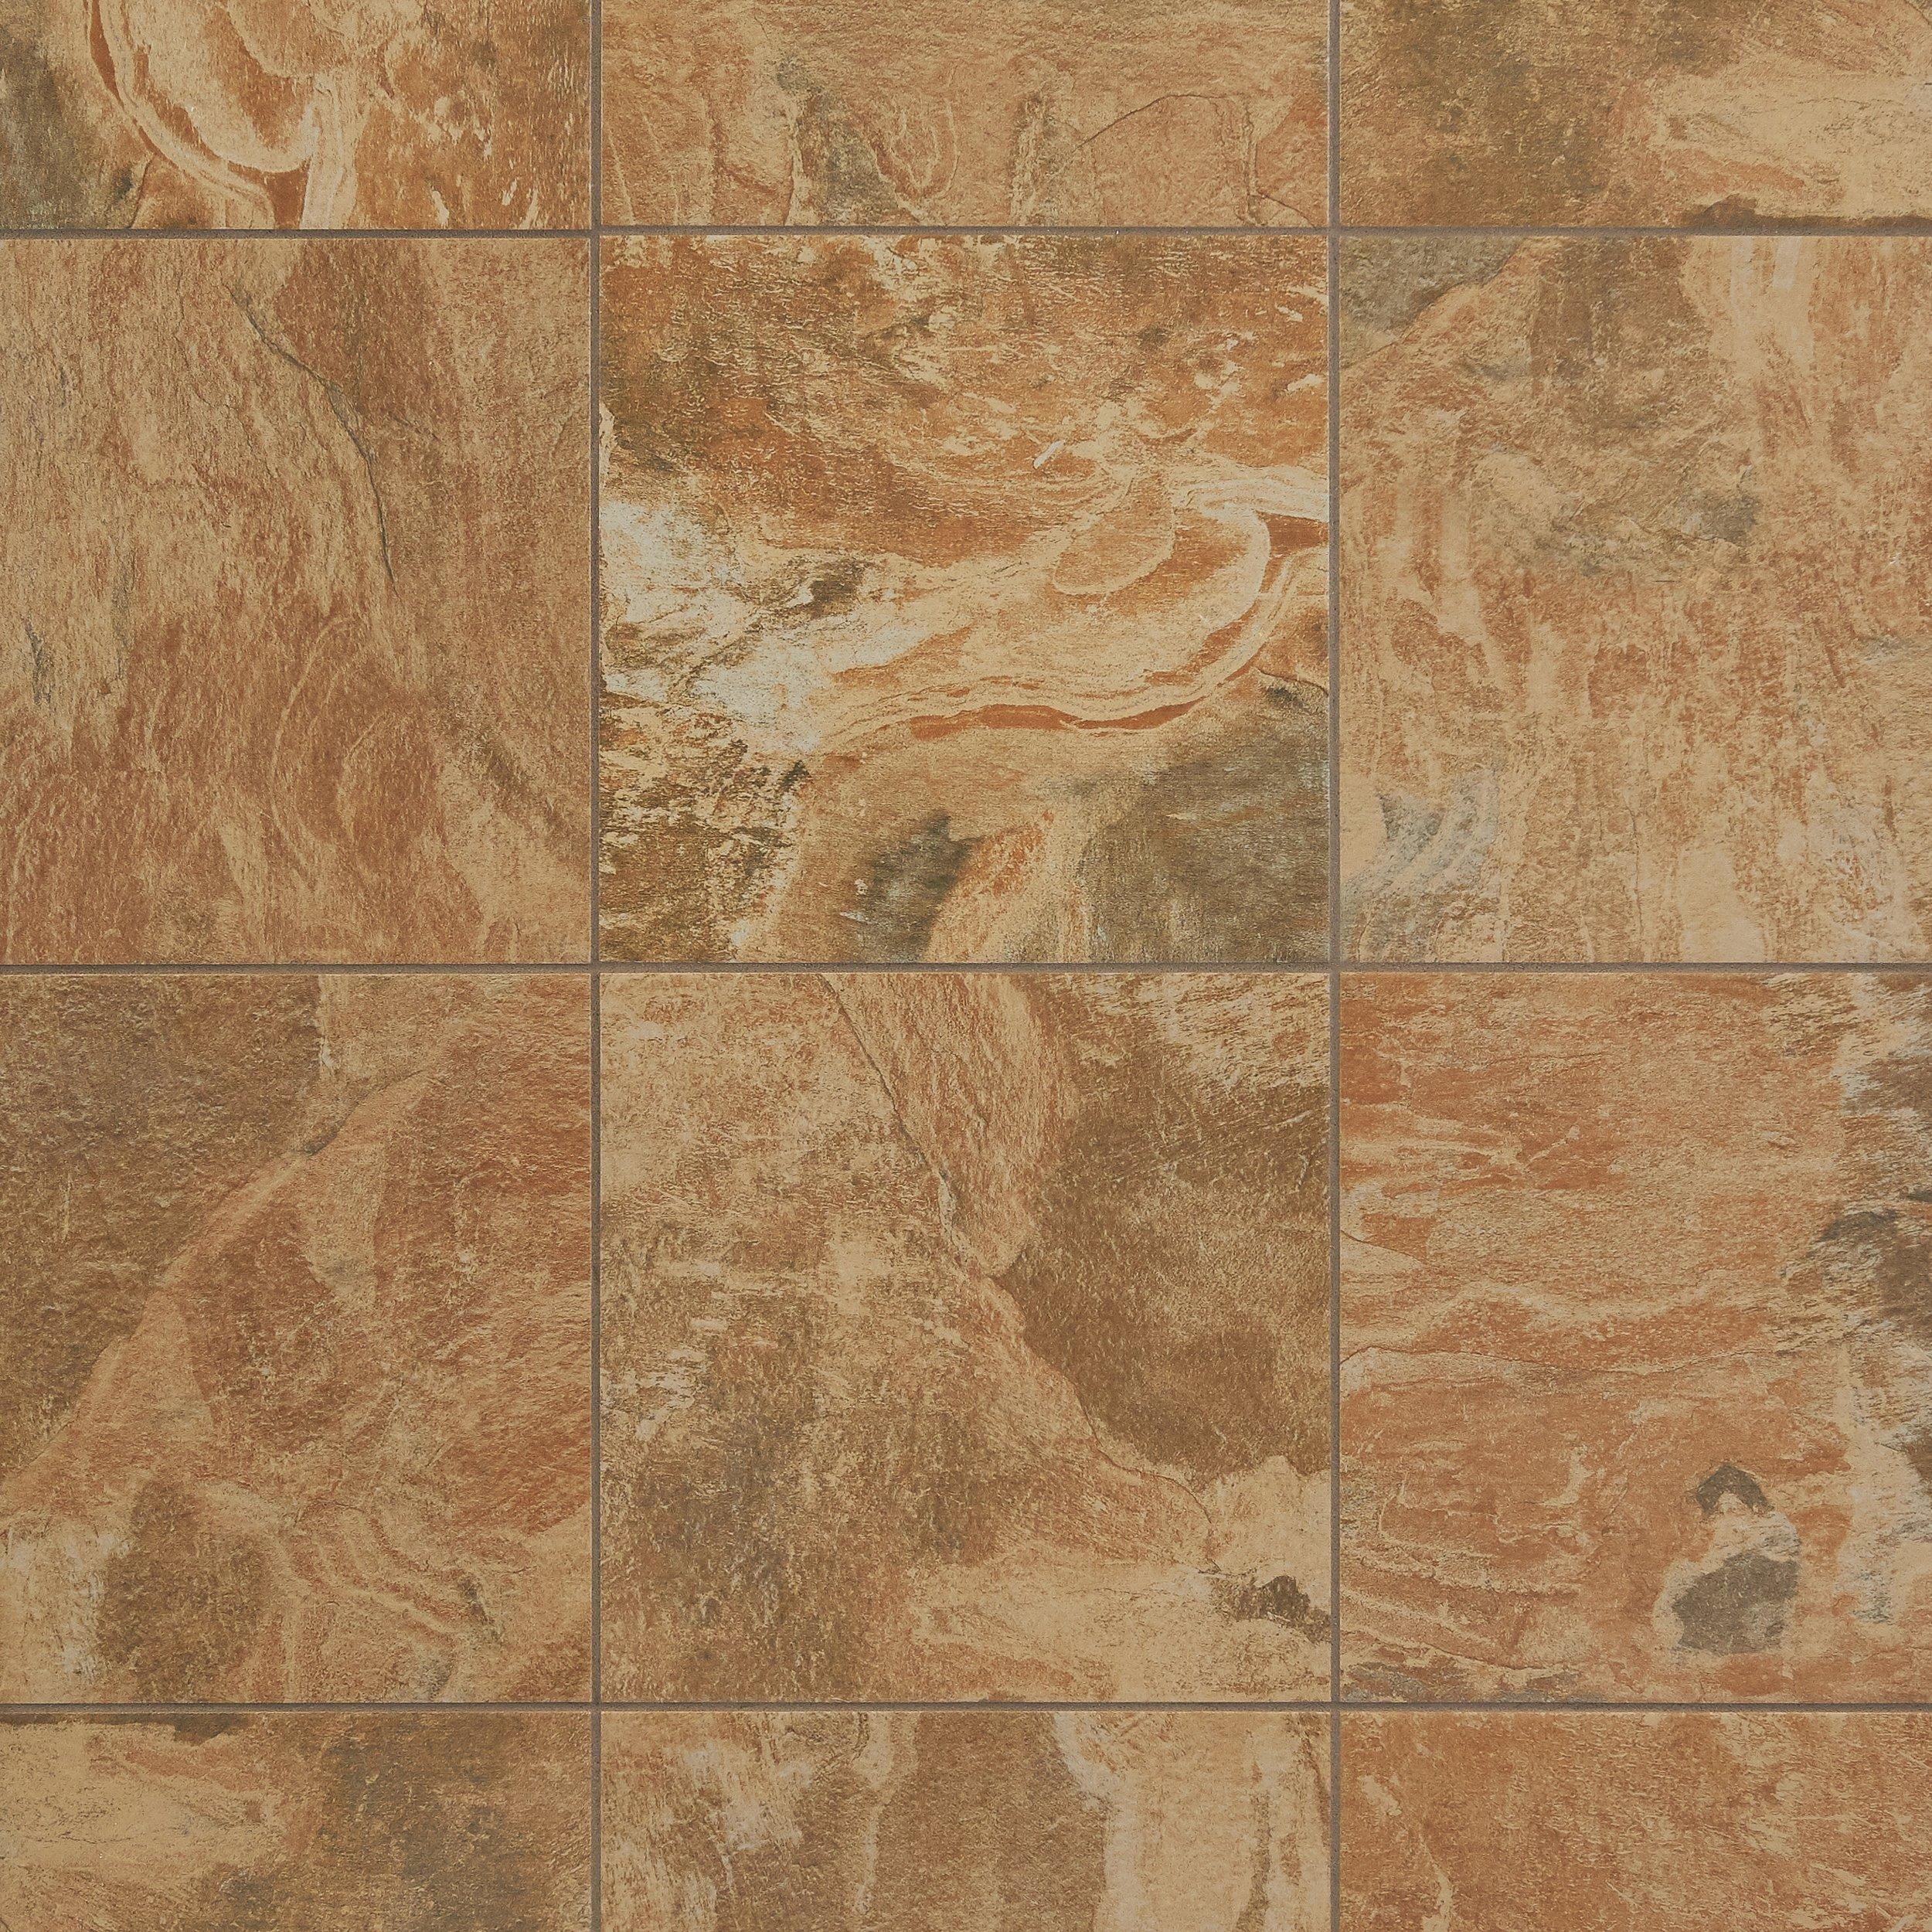 Spanish Steps Rust Porcelain Tile 12 x 12 912101431 Floor and